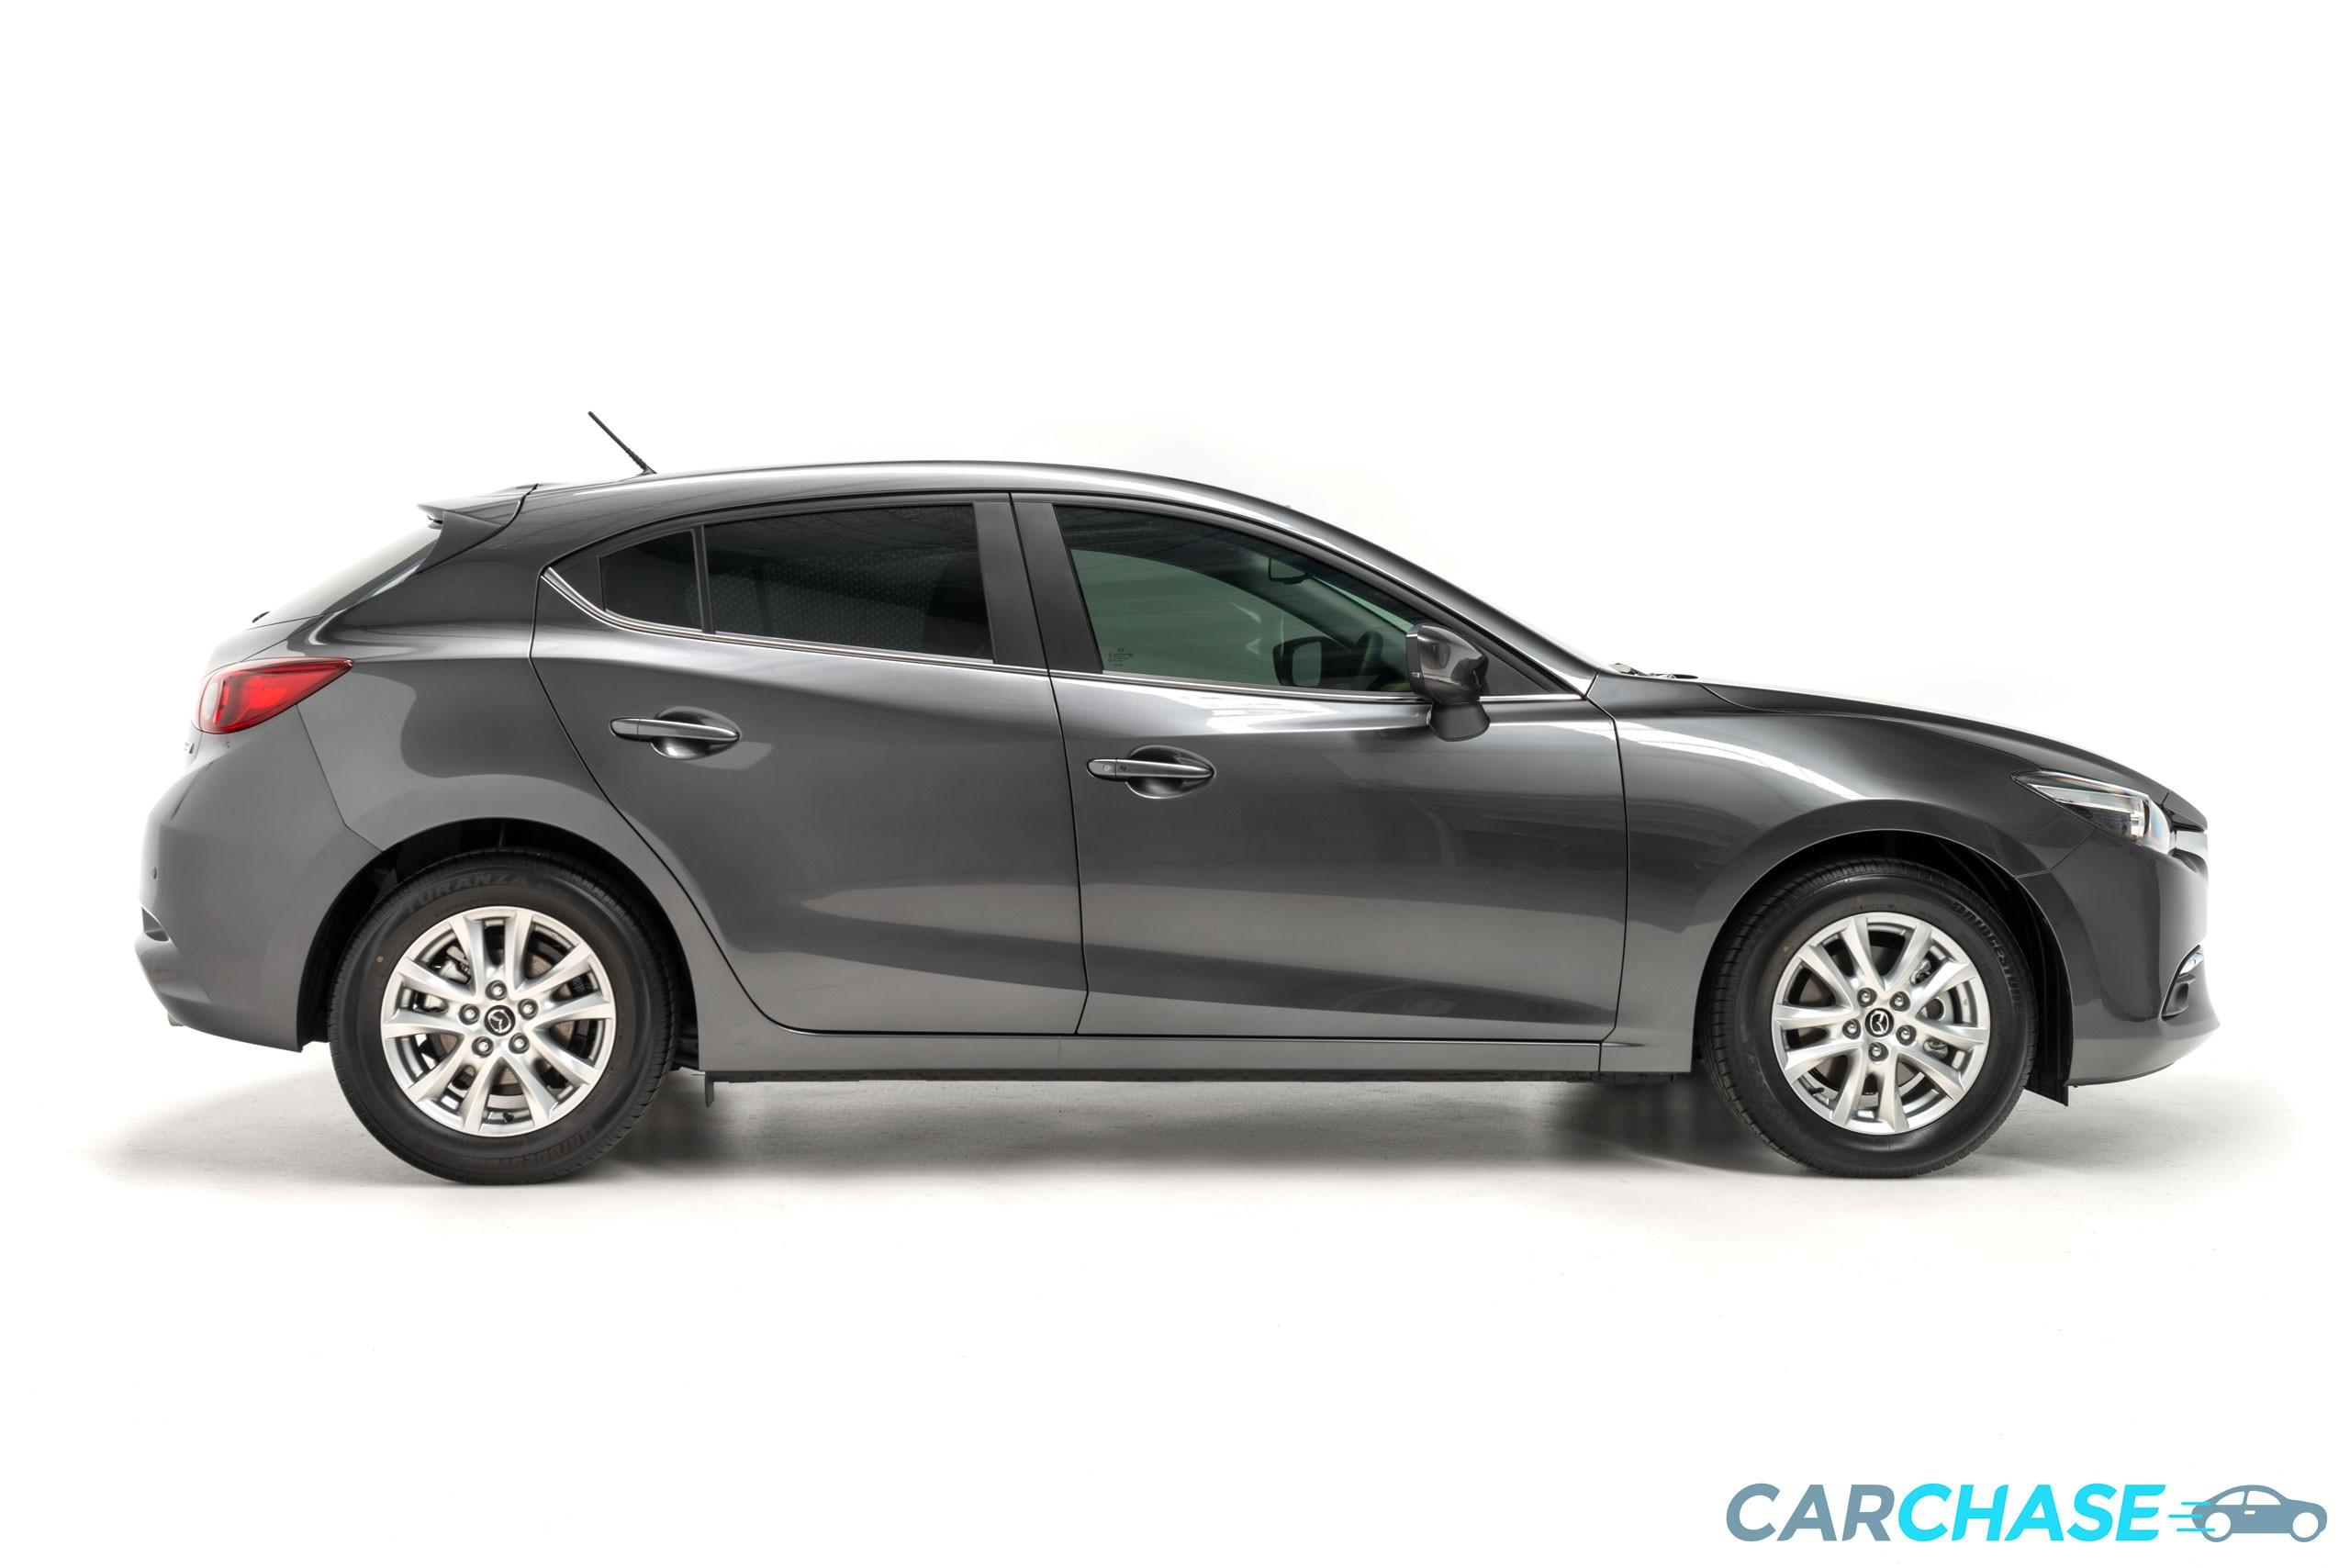 Image 1/10 of 2018 Mazda 3 Touring